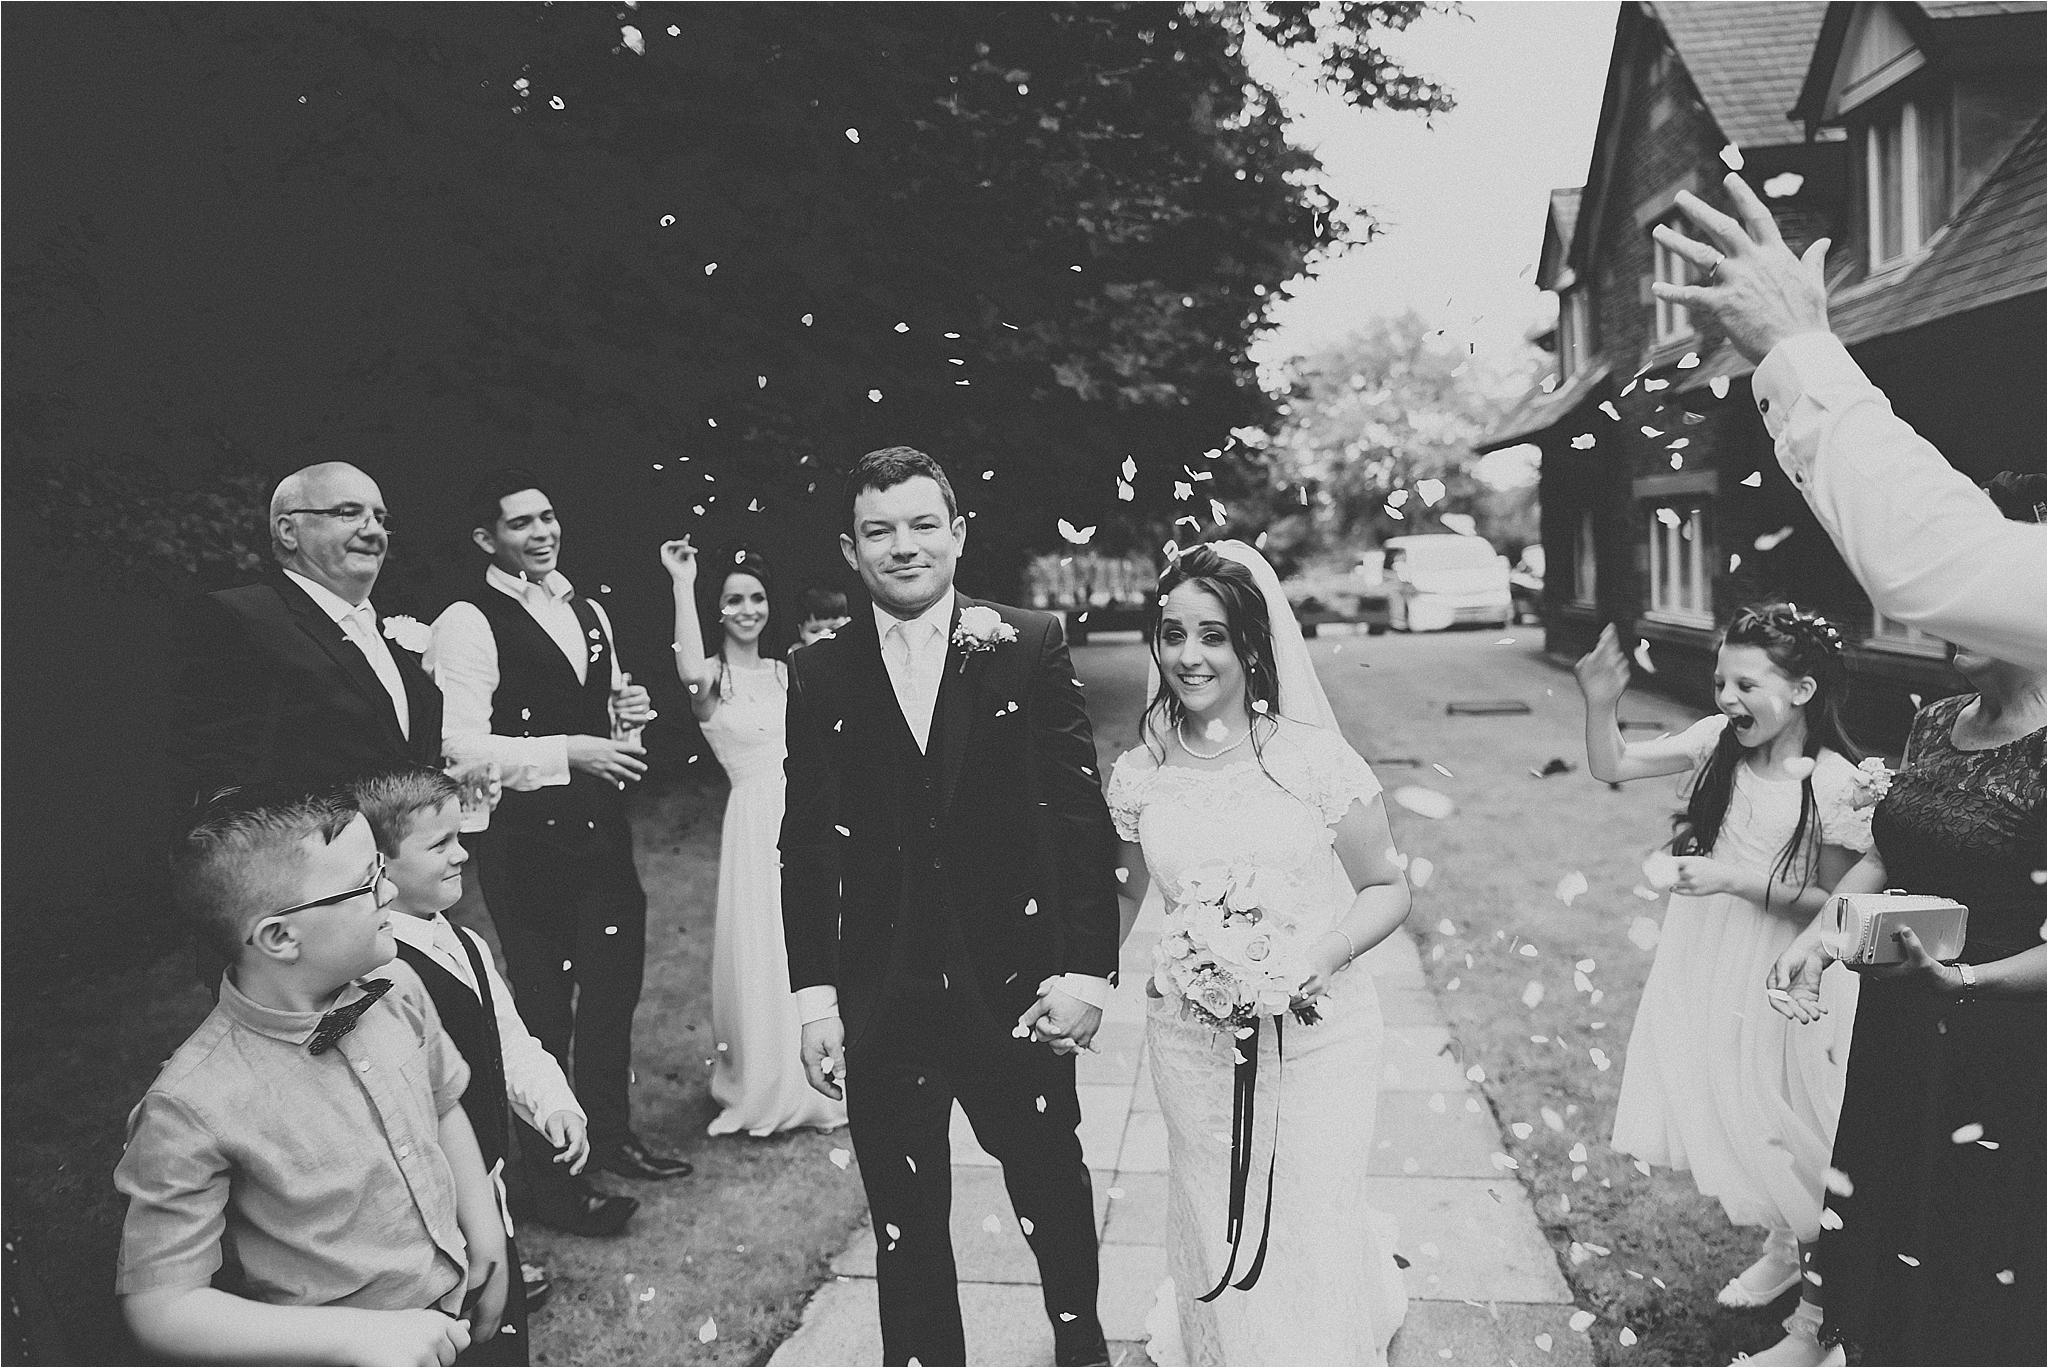 thevilla+lancashire+wreagreen+wedding+photographer100.jpg